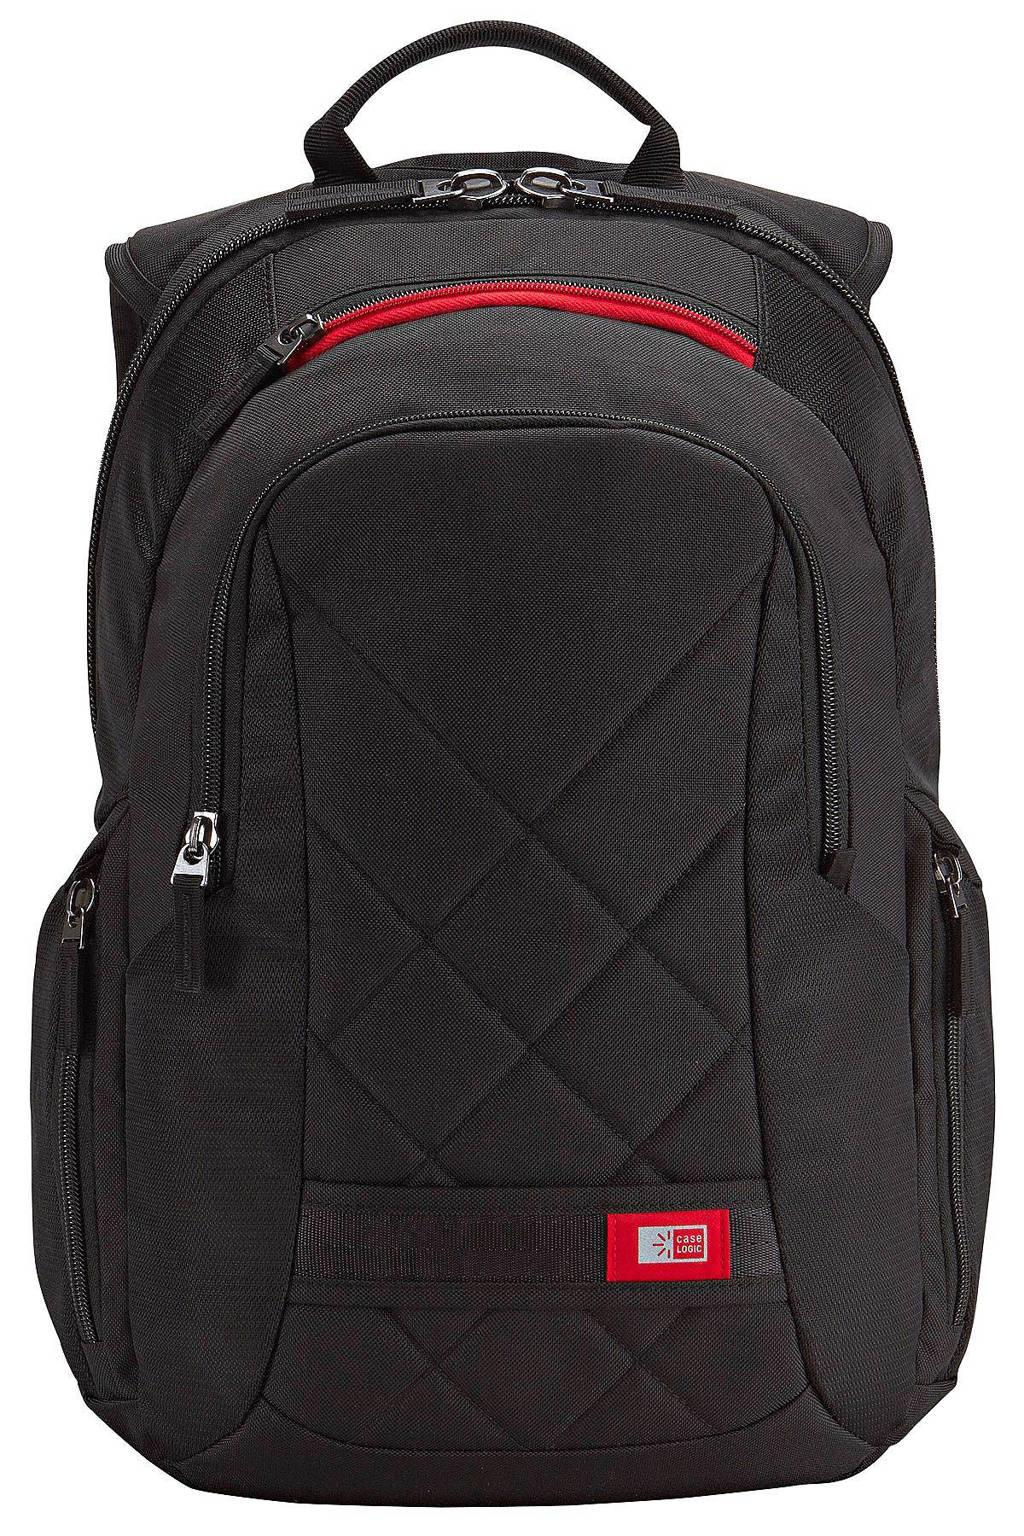 later hete verkoop spotgoedkoop Case Logic Sporty 14 inch laptop rugzak | wehkamp